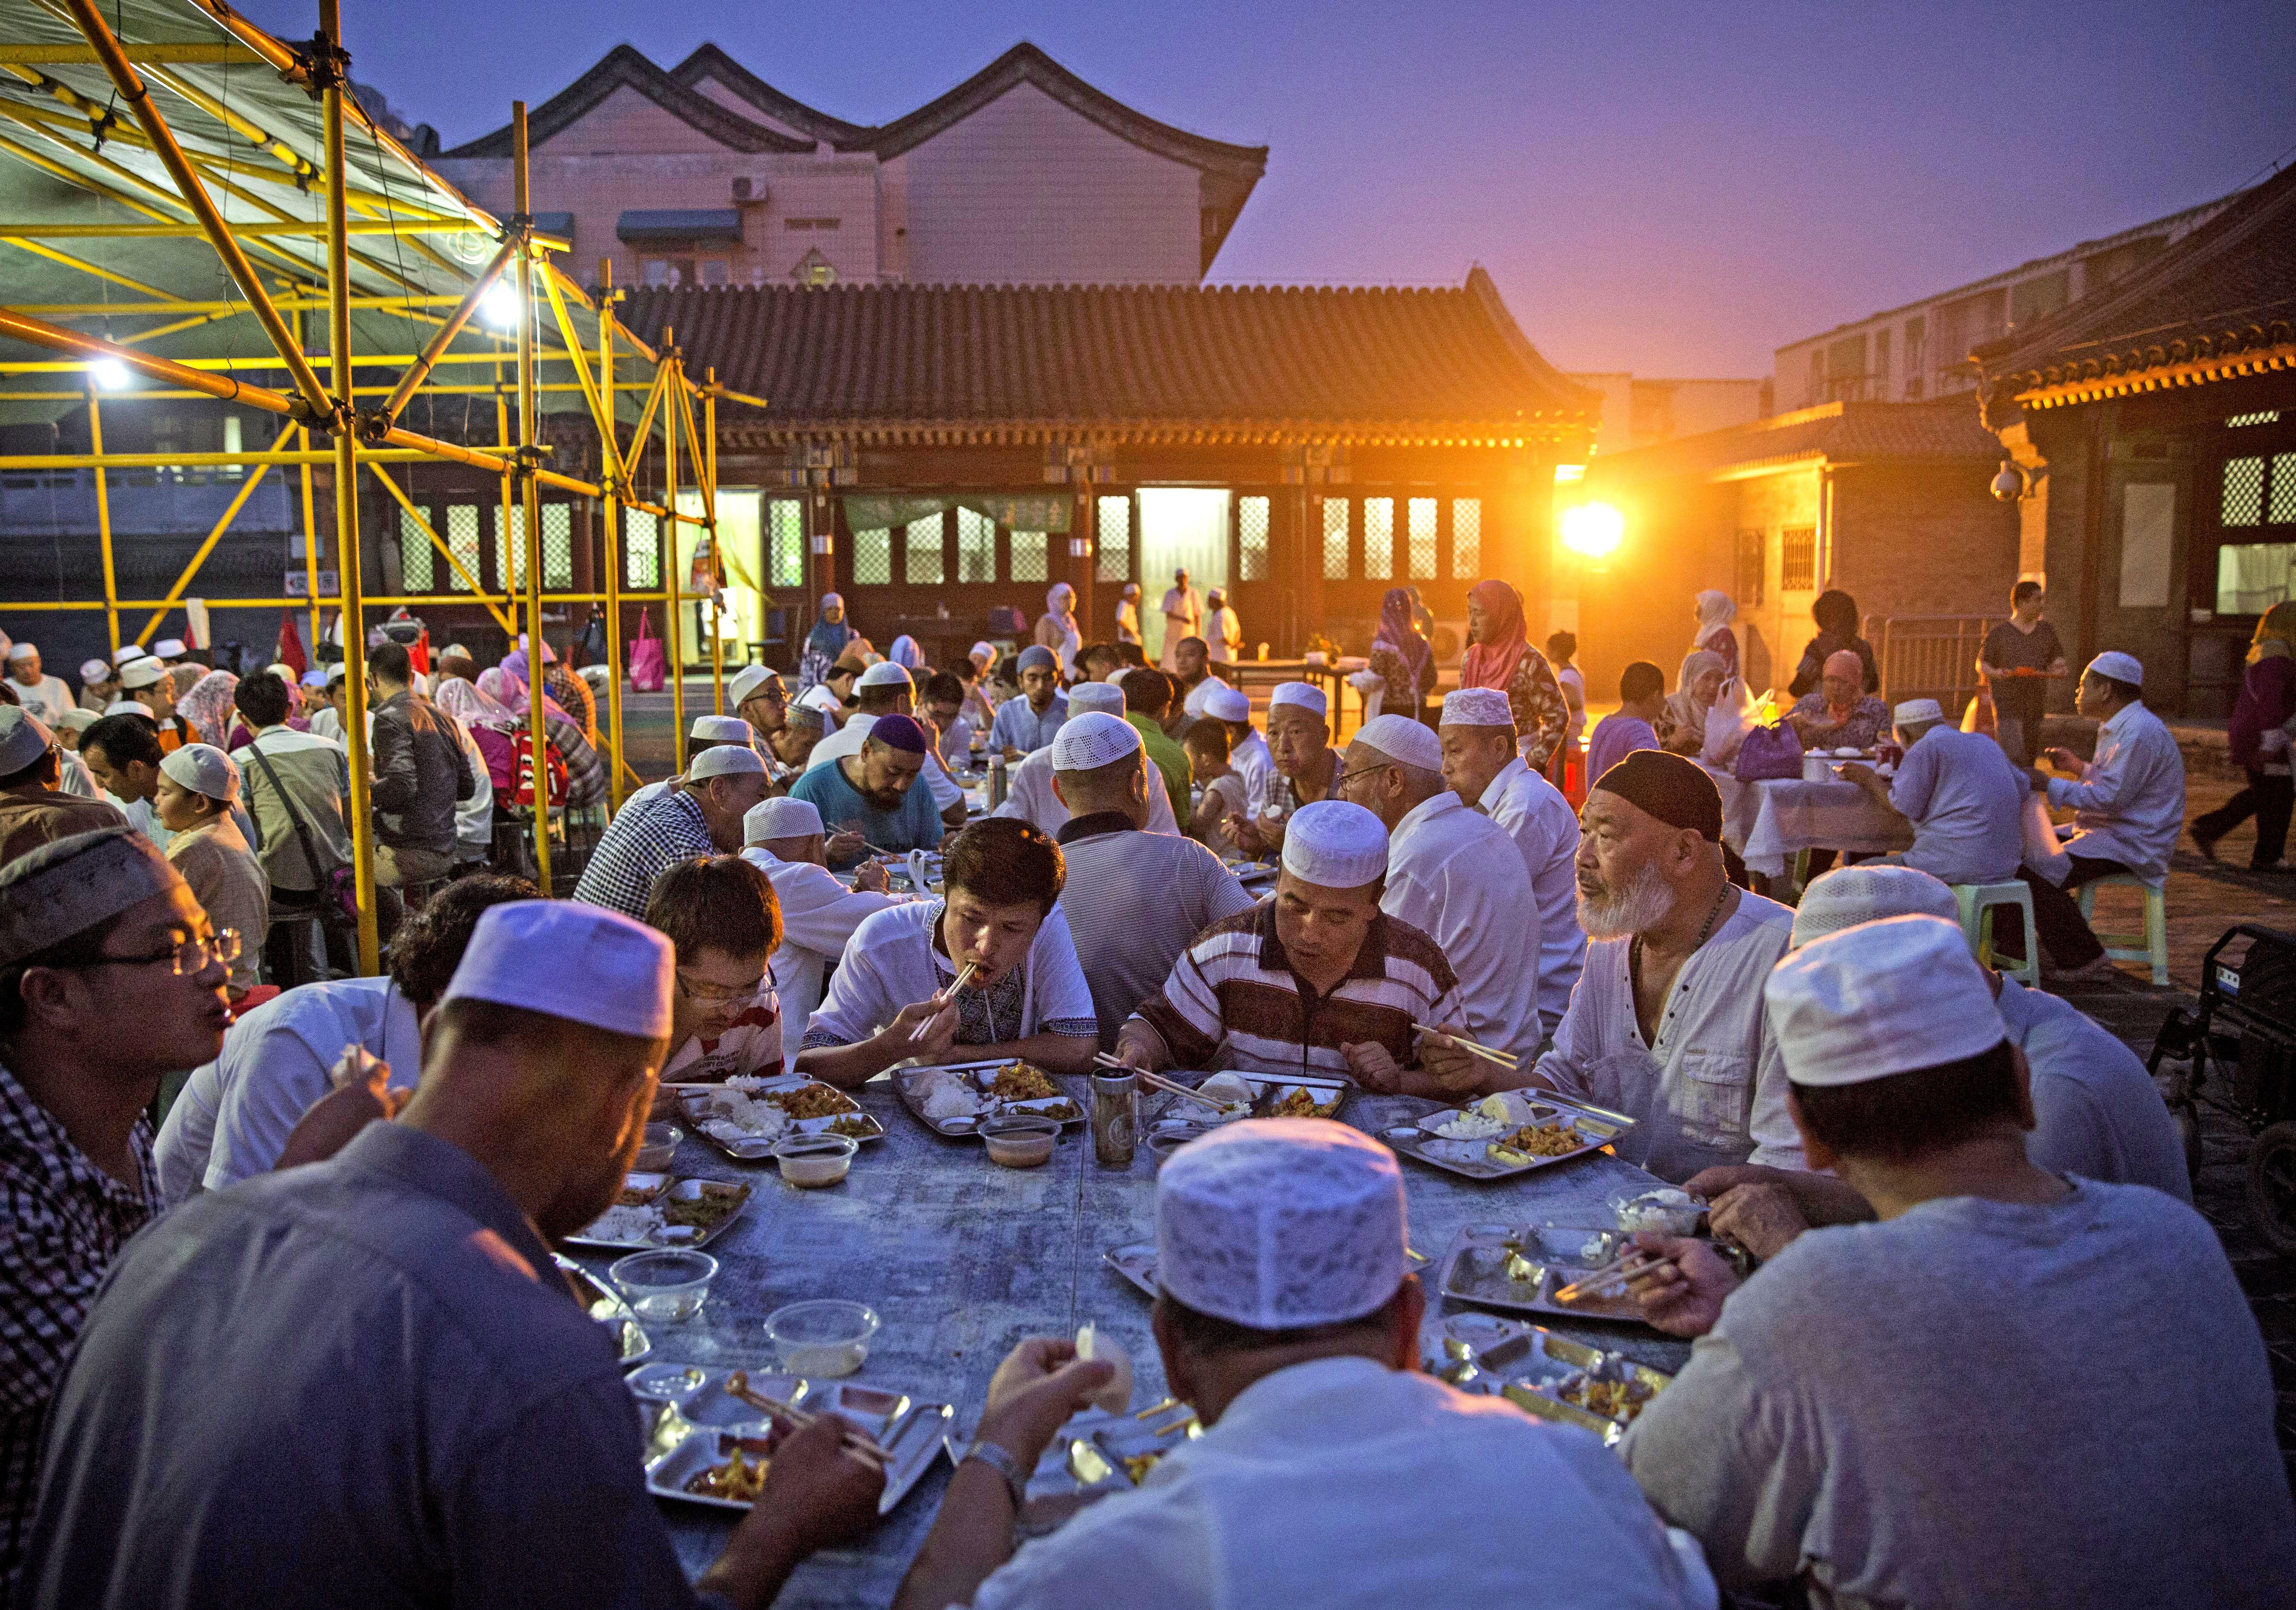 Muslims eating during Ramadan in Asia